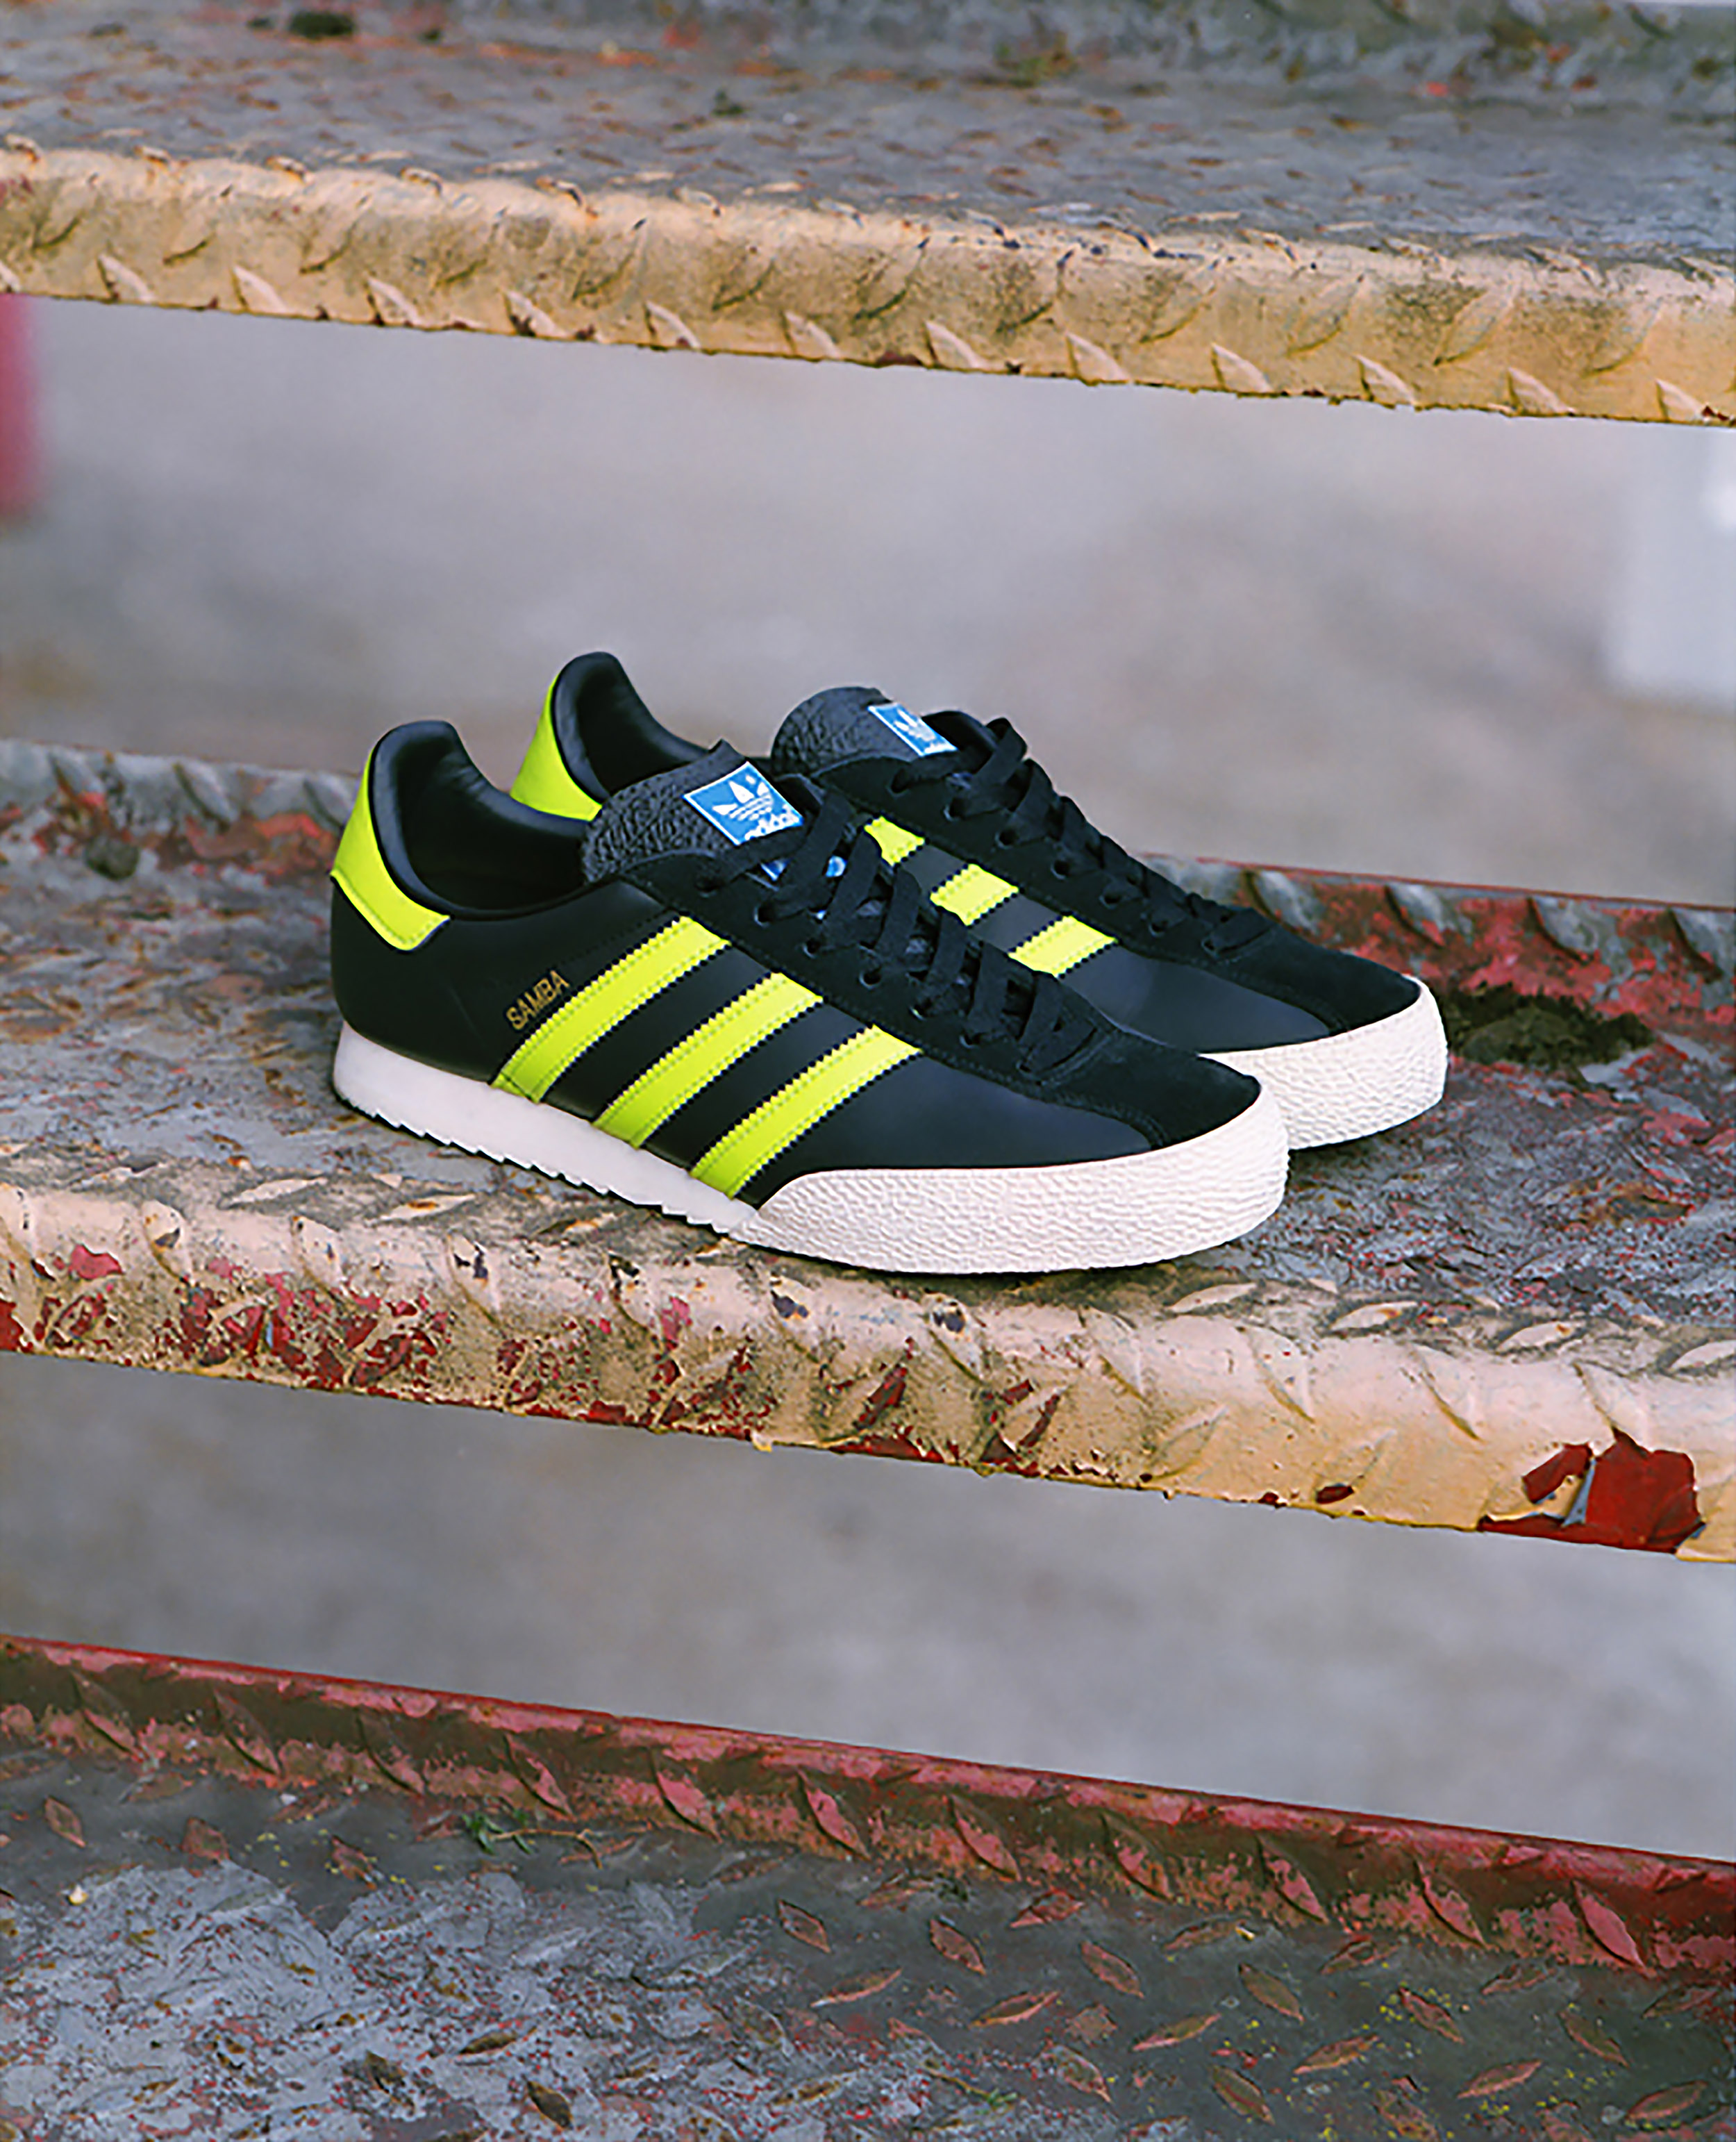 adidas_spezial_samba_3